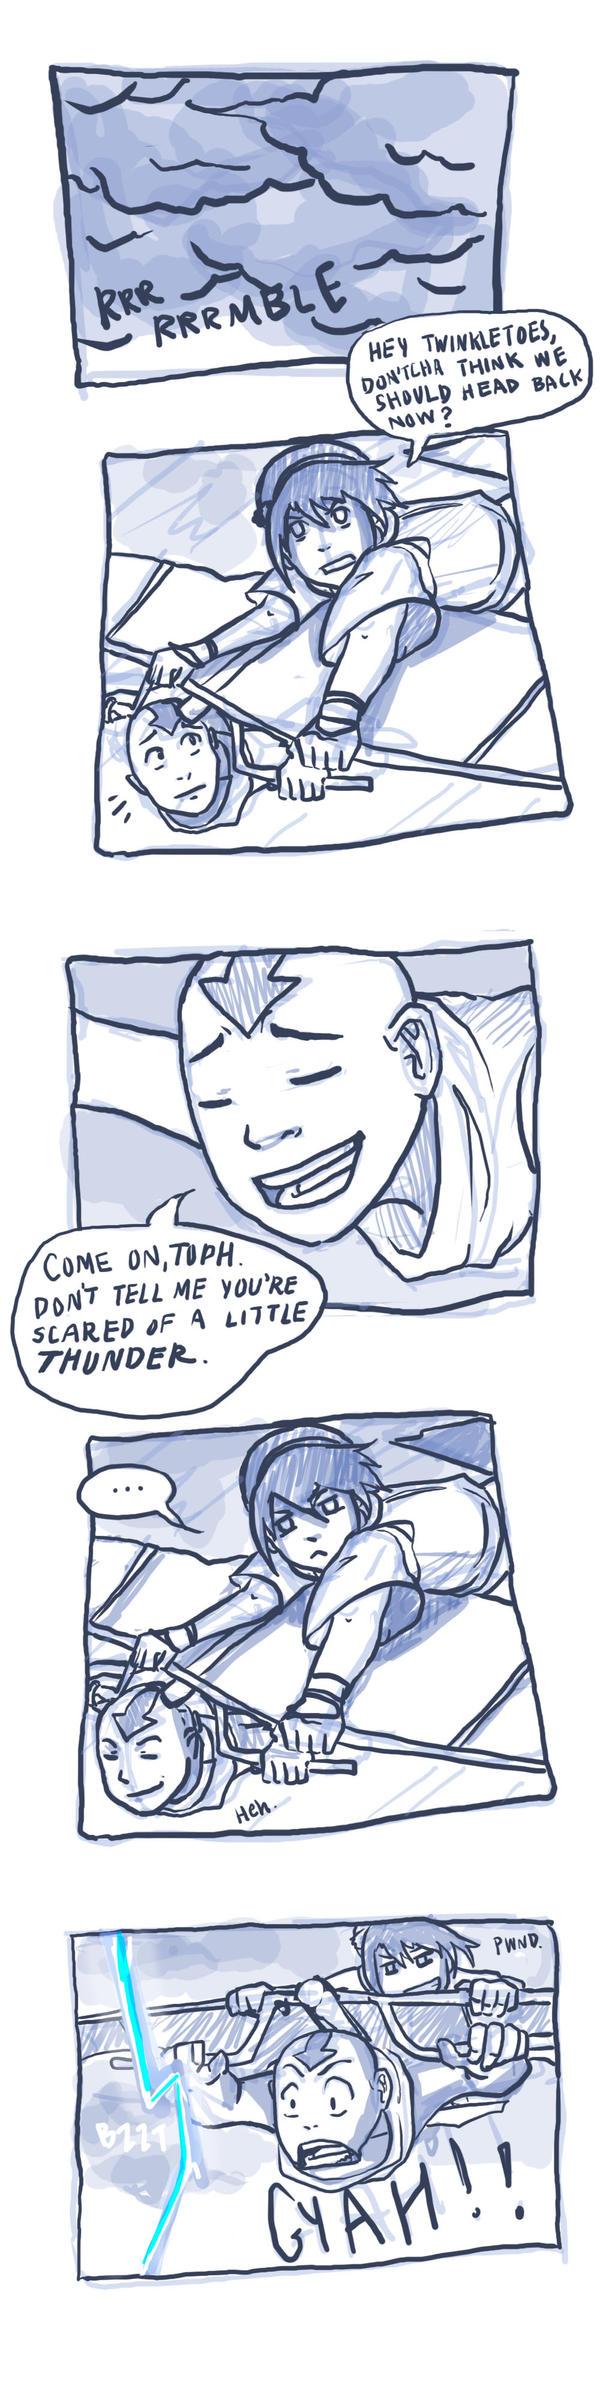 TW-Thunder by elontirien